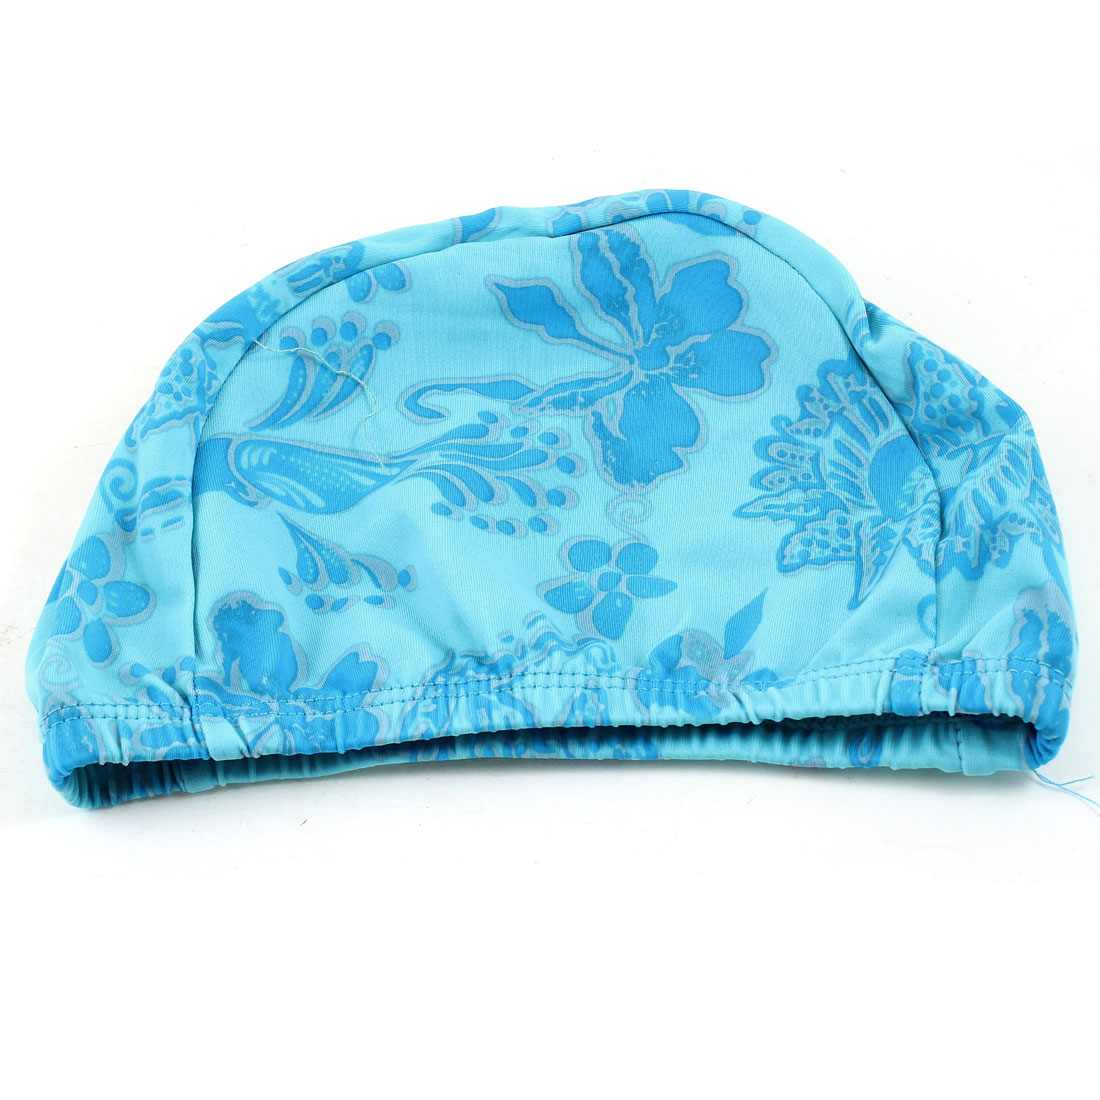 Dome Design Blue Flowers Print Elastic Swimming Cap Hat for Women Men